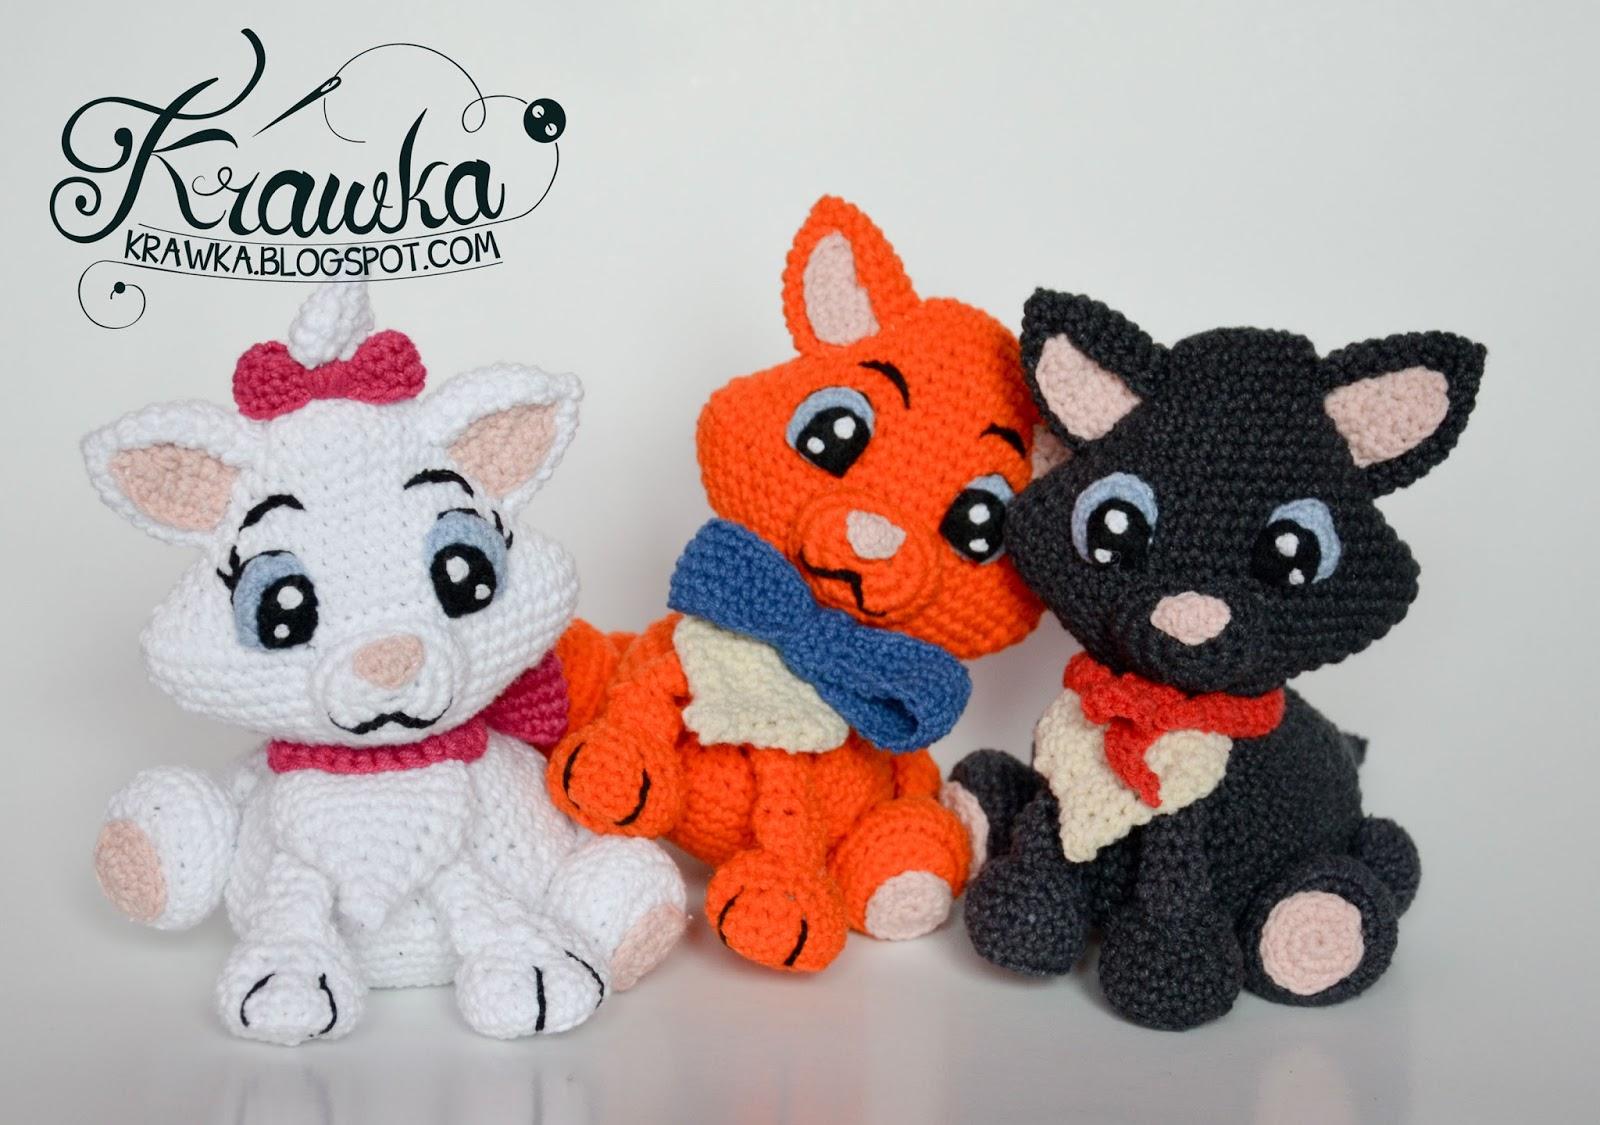 Free Amigurumi Disney Patterns : Krawka: aristocats marie belioz toulouse disney cats etsy pattern